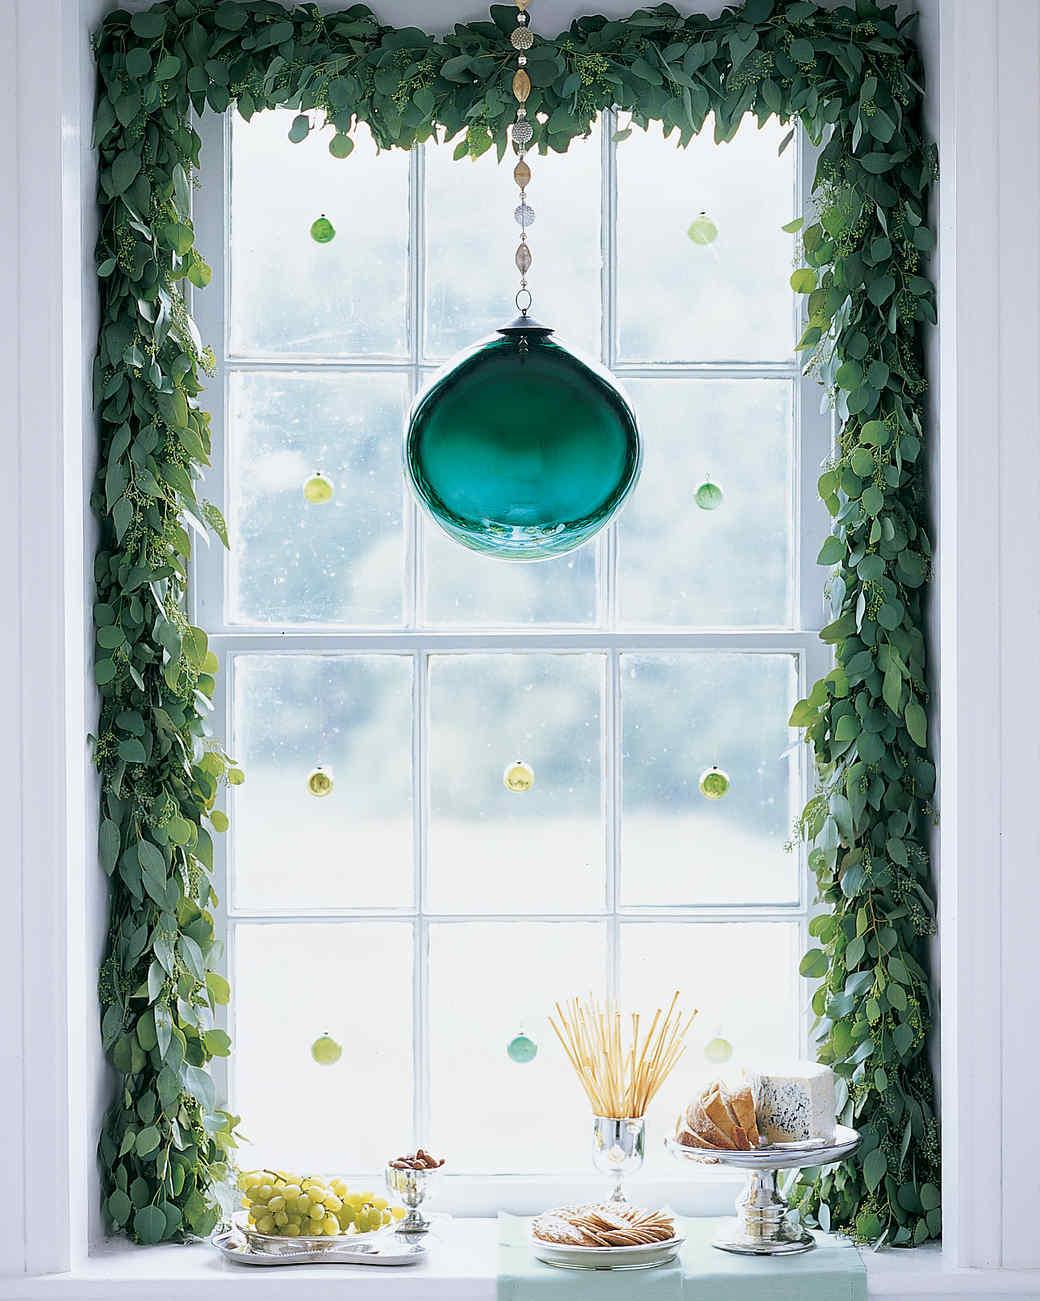 window-kugel-01-MLA102543.jpg